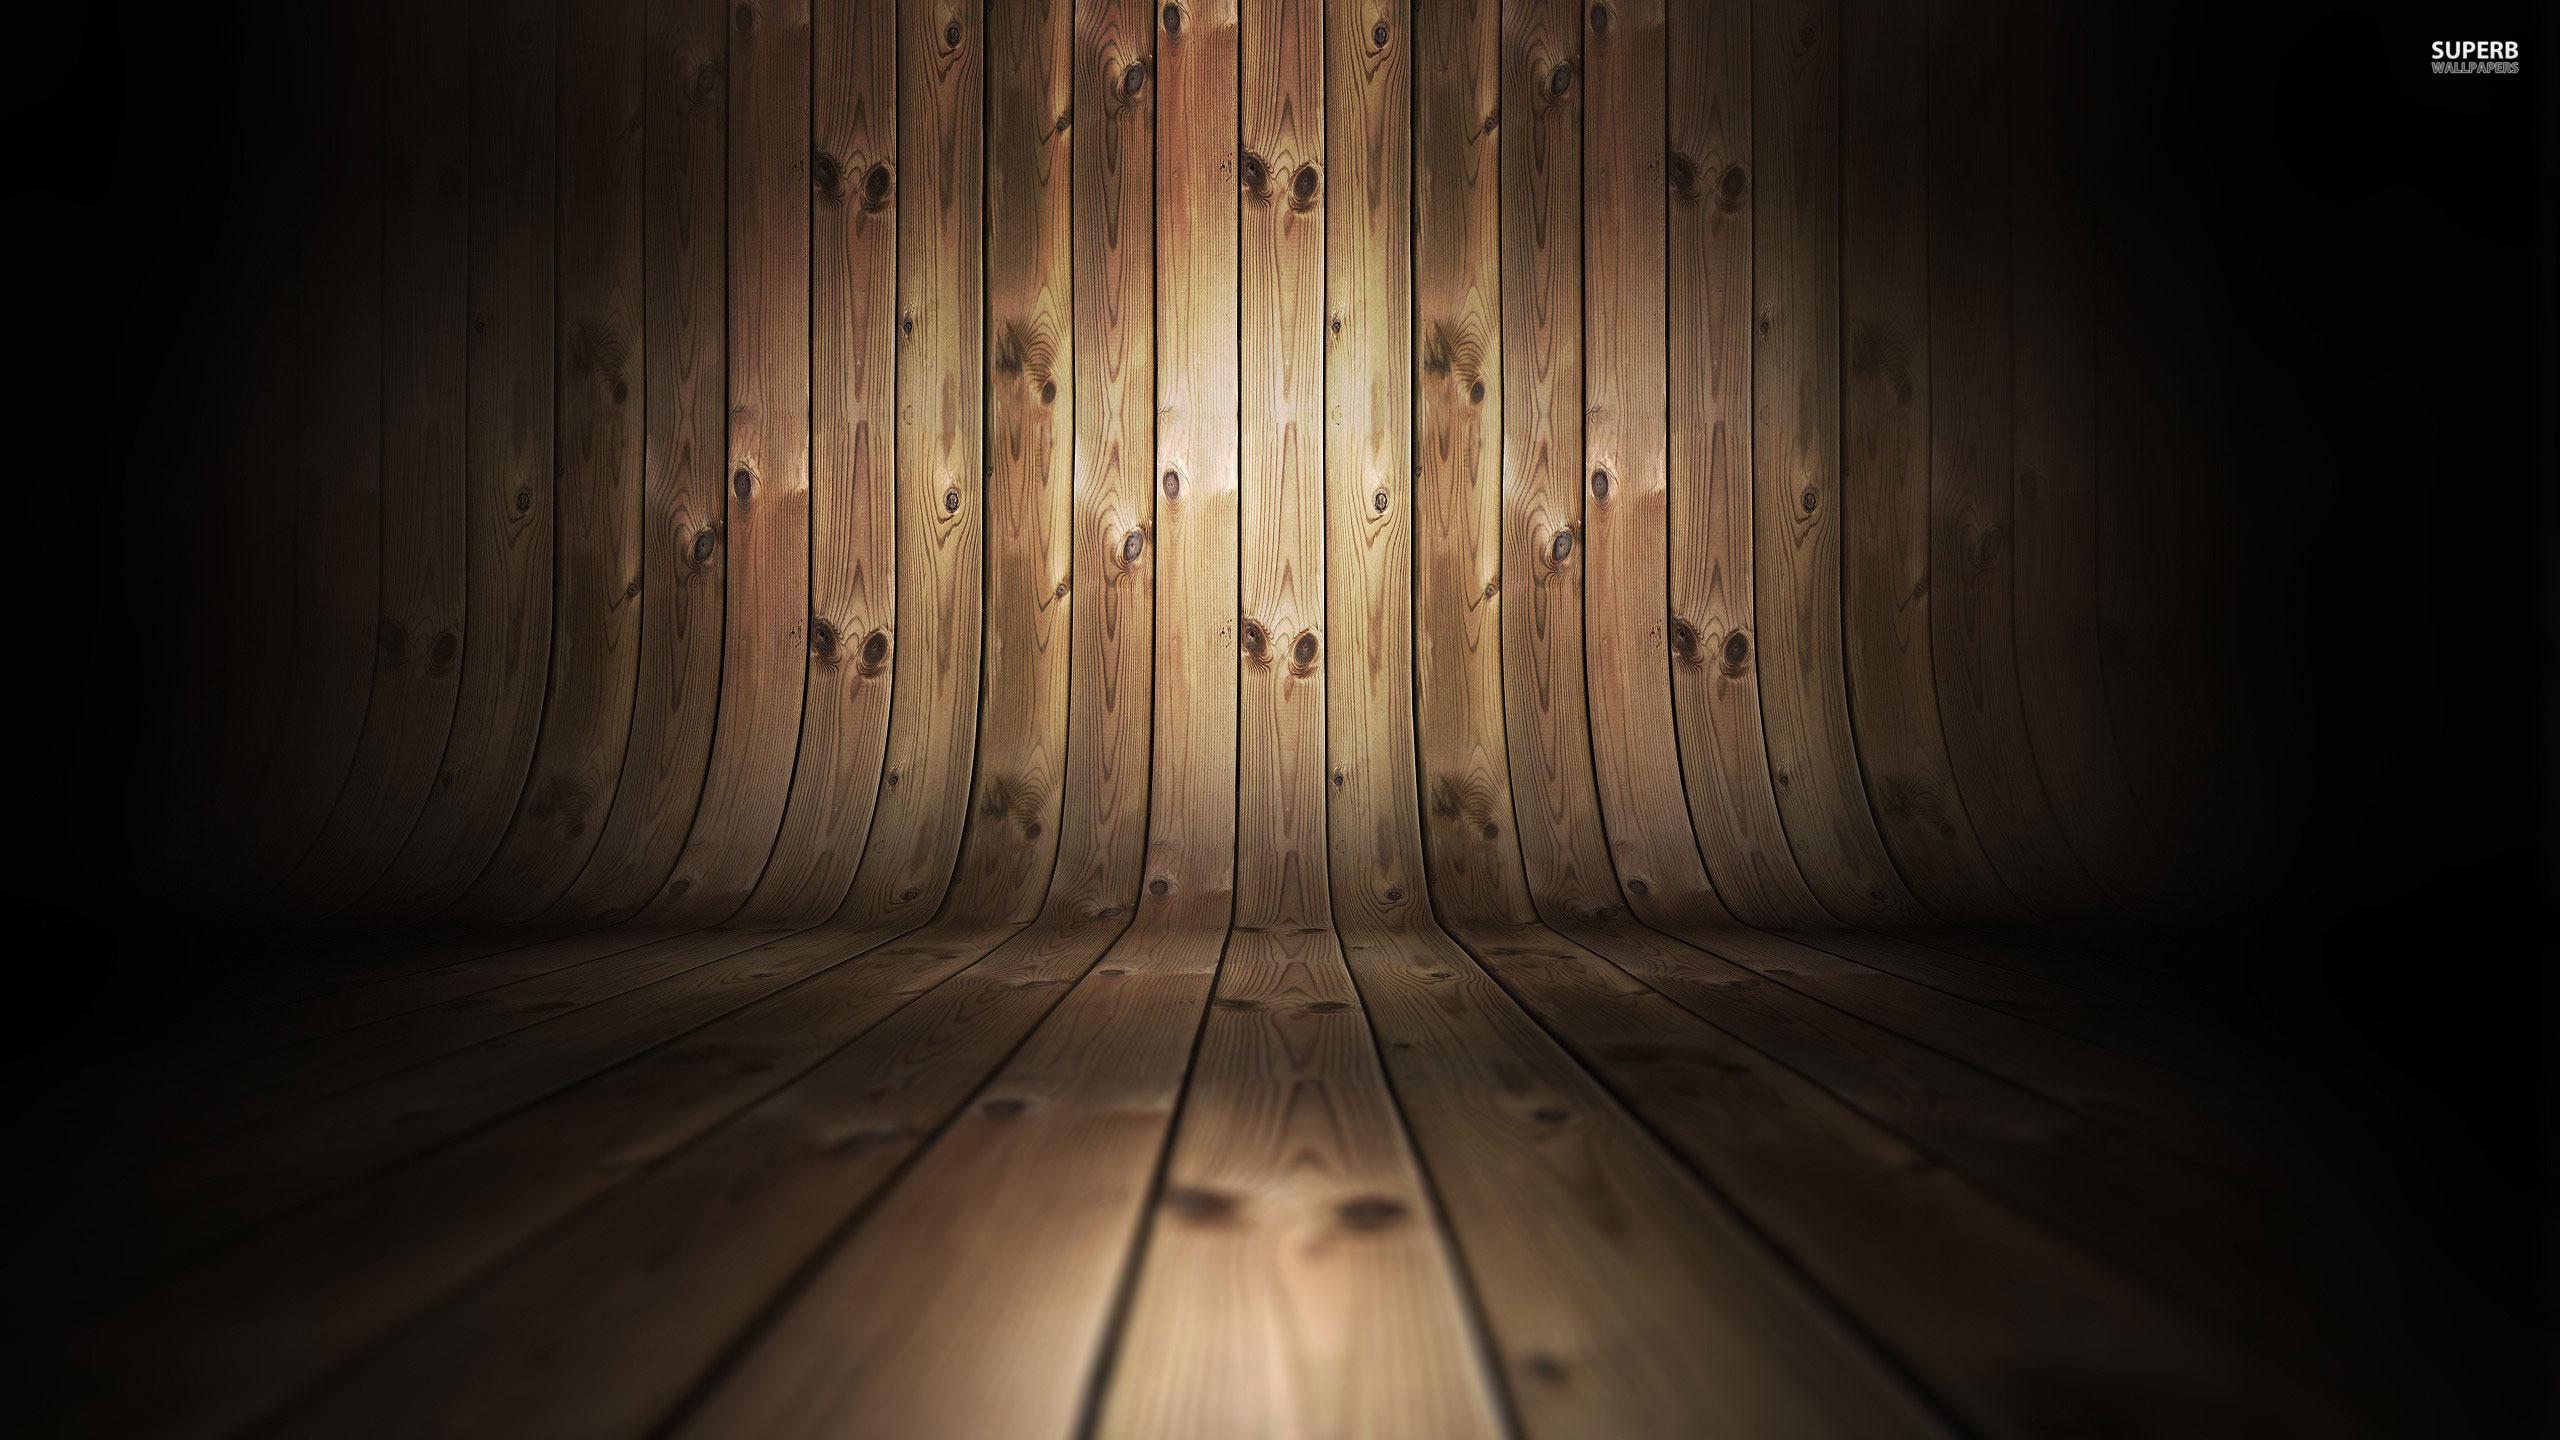 Hardwood floor pattern wallpaper – Artistic wallpapers – #14796